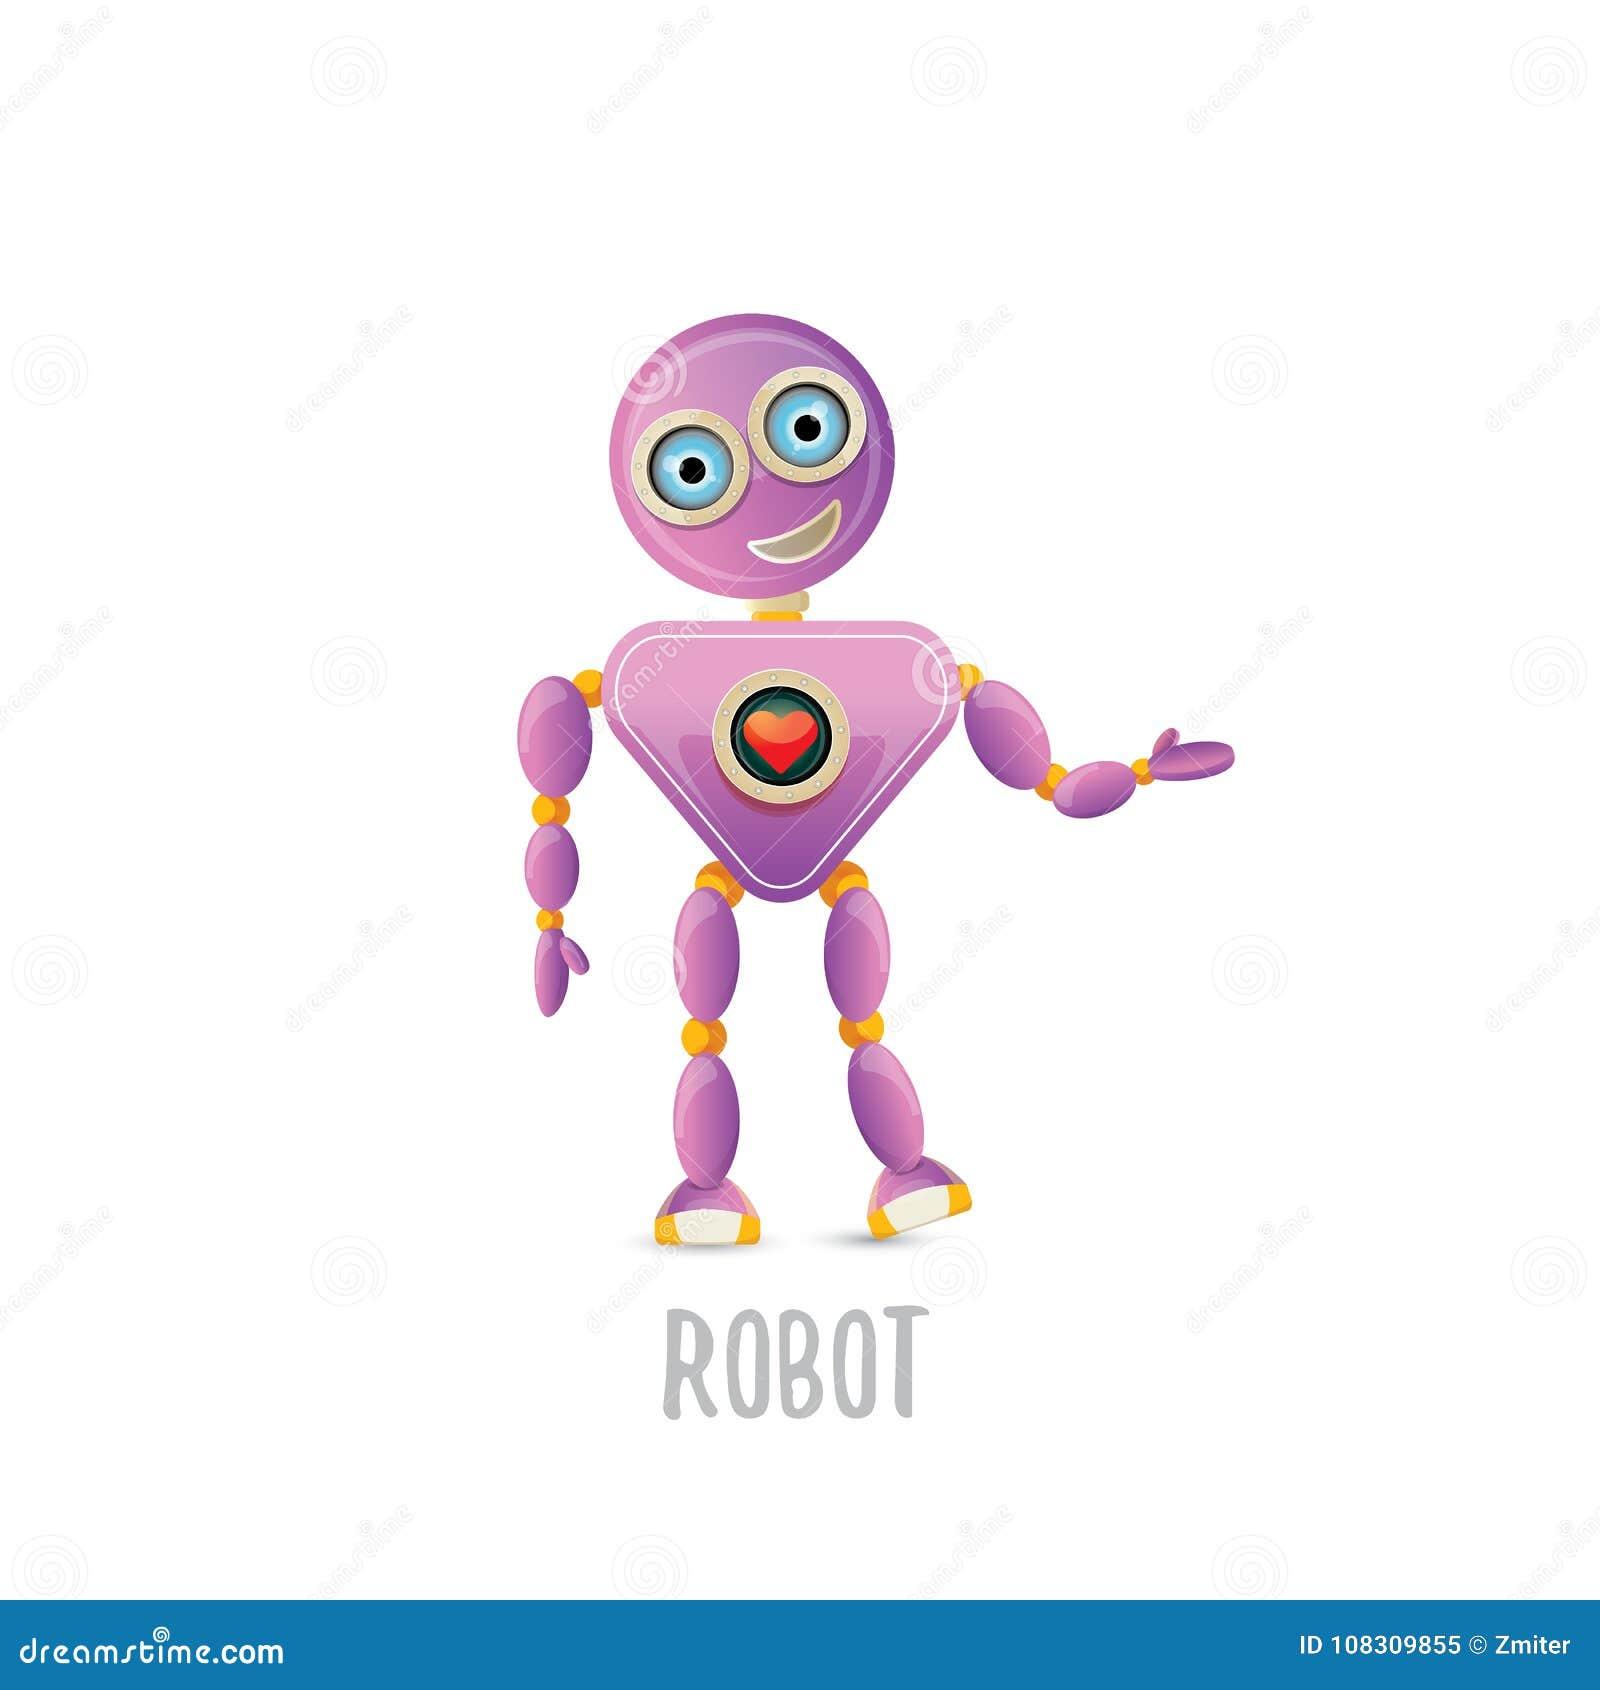 Vector funny cartoon purple friendly robot character isolated on download vector funny cartoon purple friendly robot character isolated on white background kids 3d robot maxwellsz